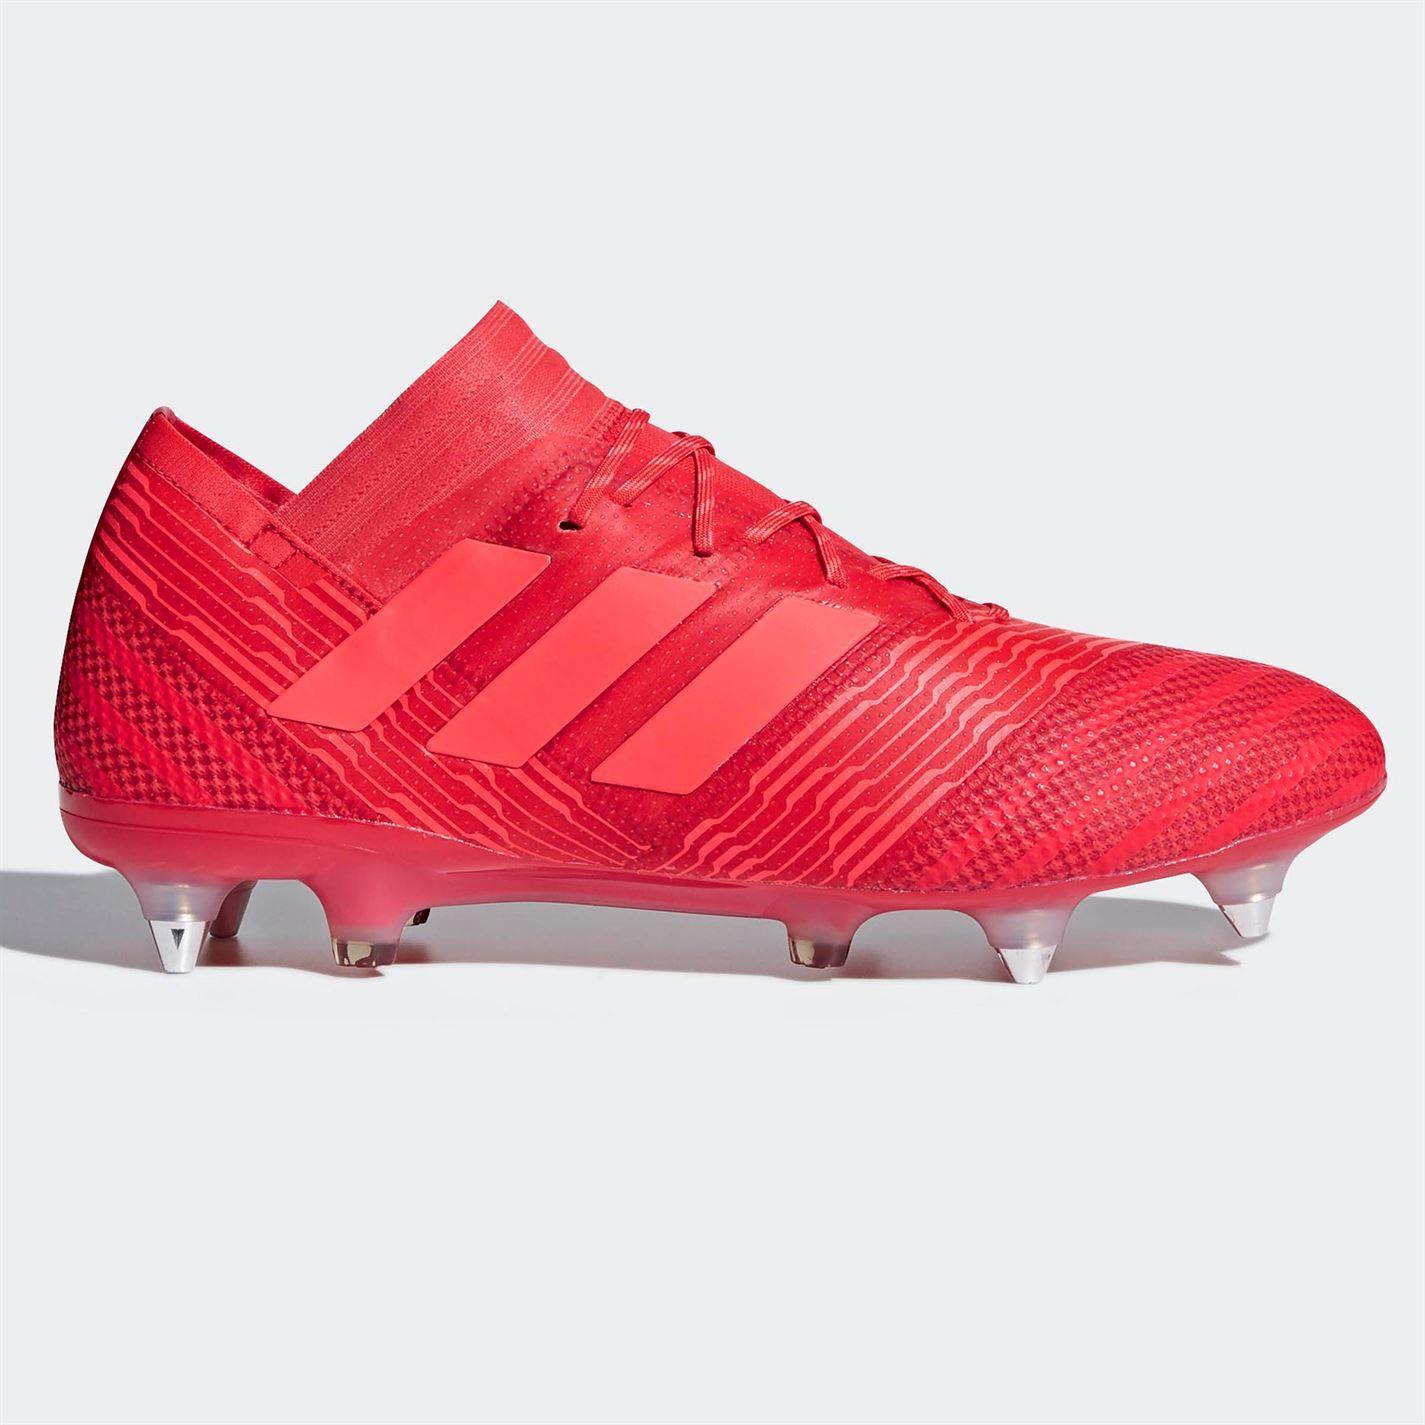 3e325dd9d773 adidas Mens Nemeziz 17.1 SG Football Boots Soft Ground Lace Up Studs Knit